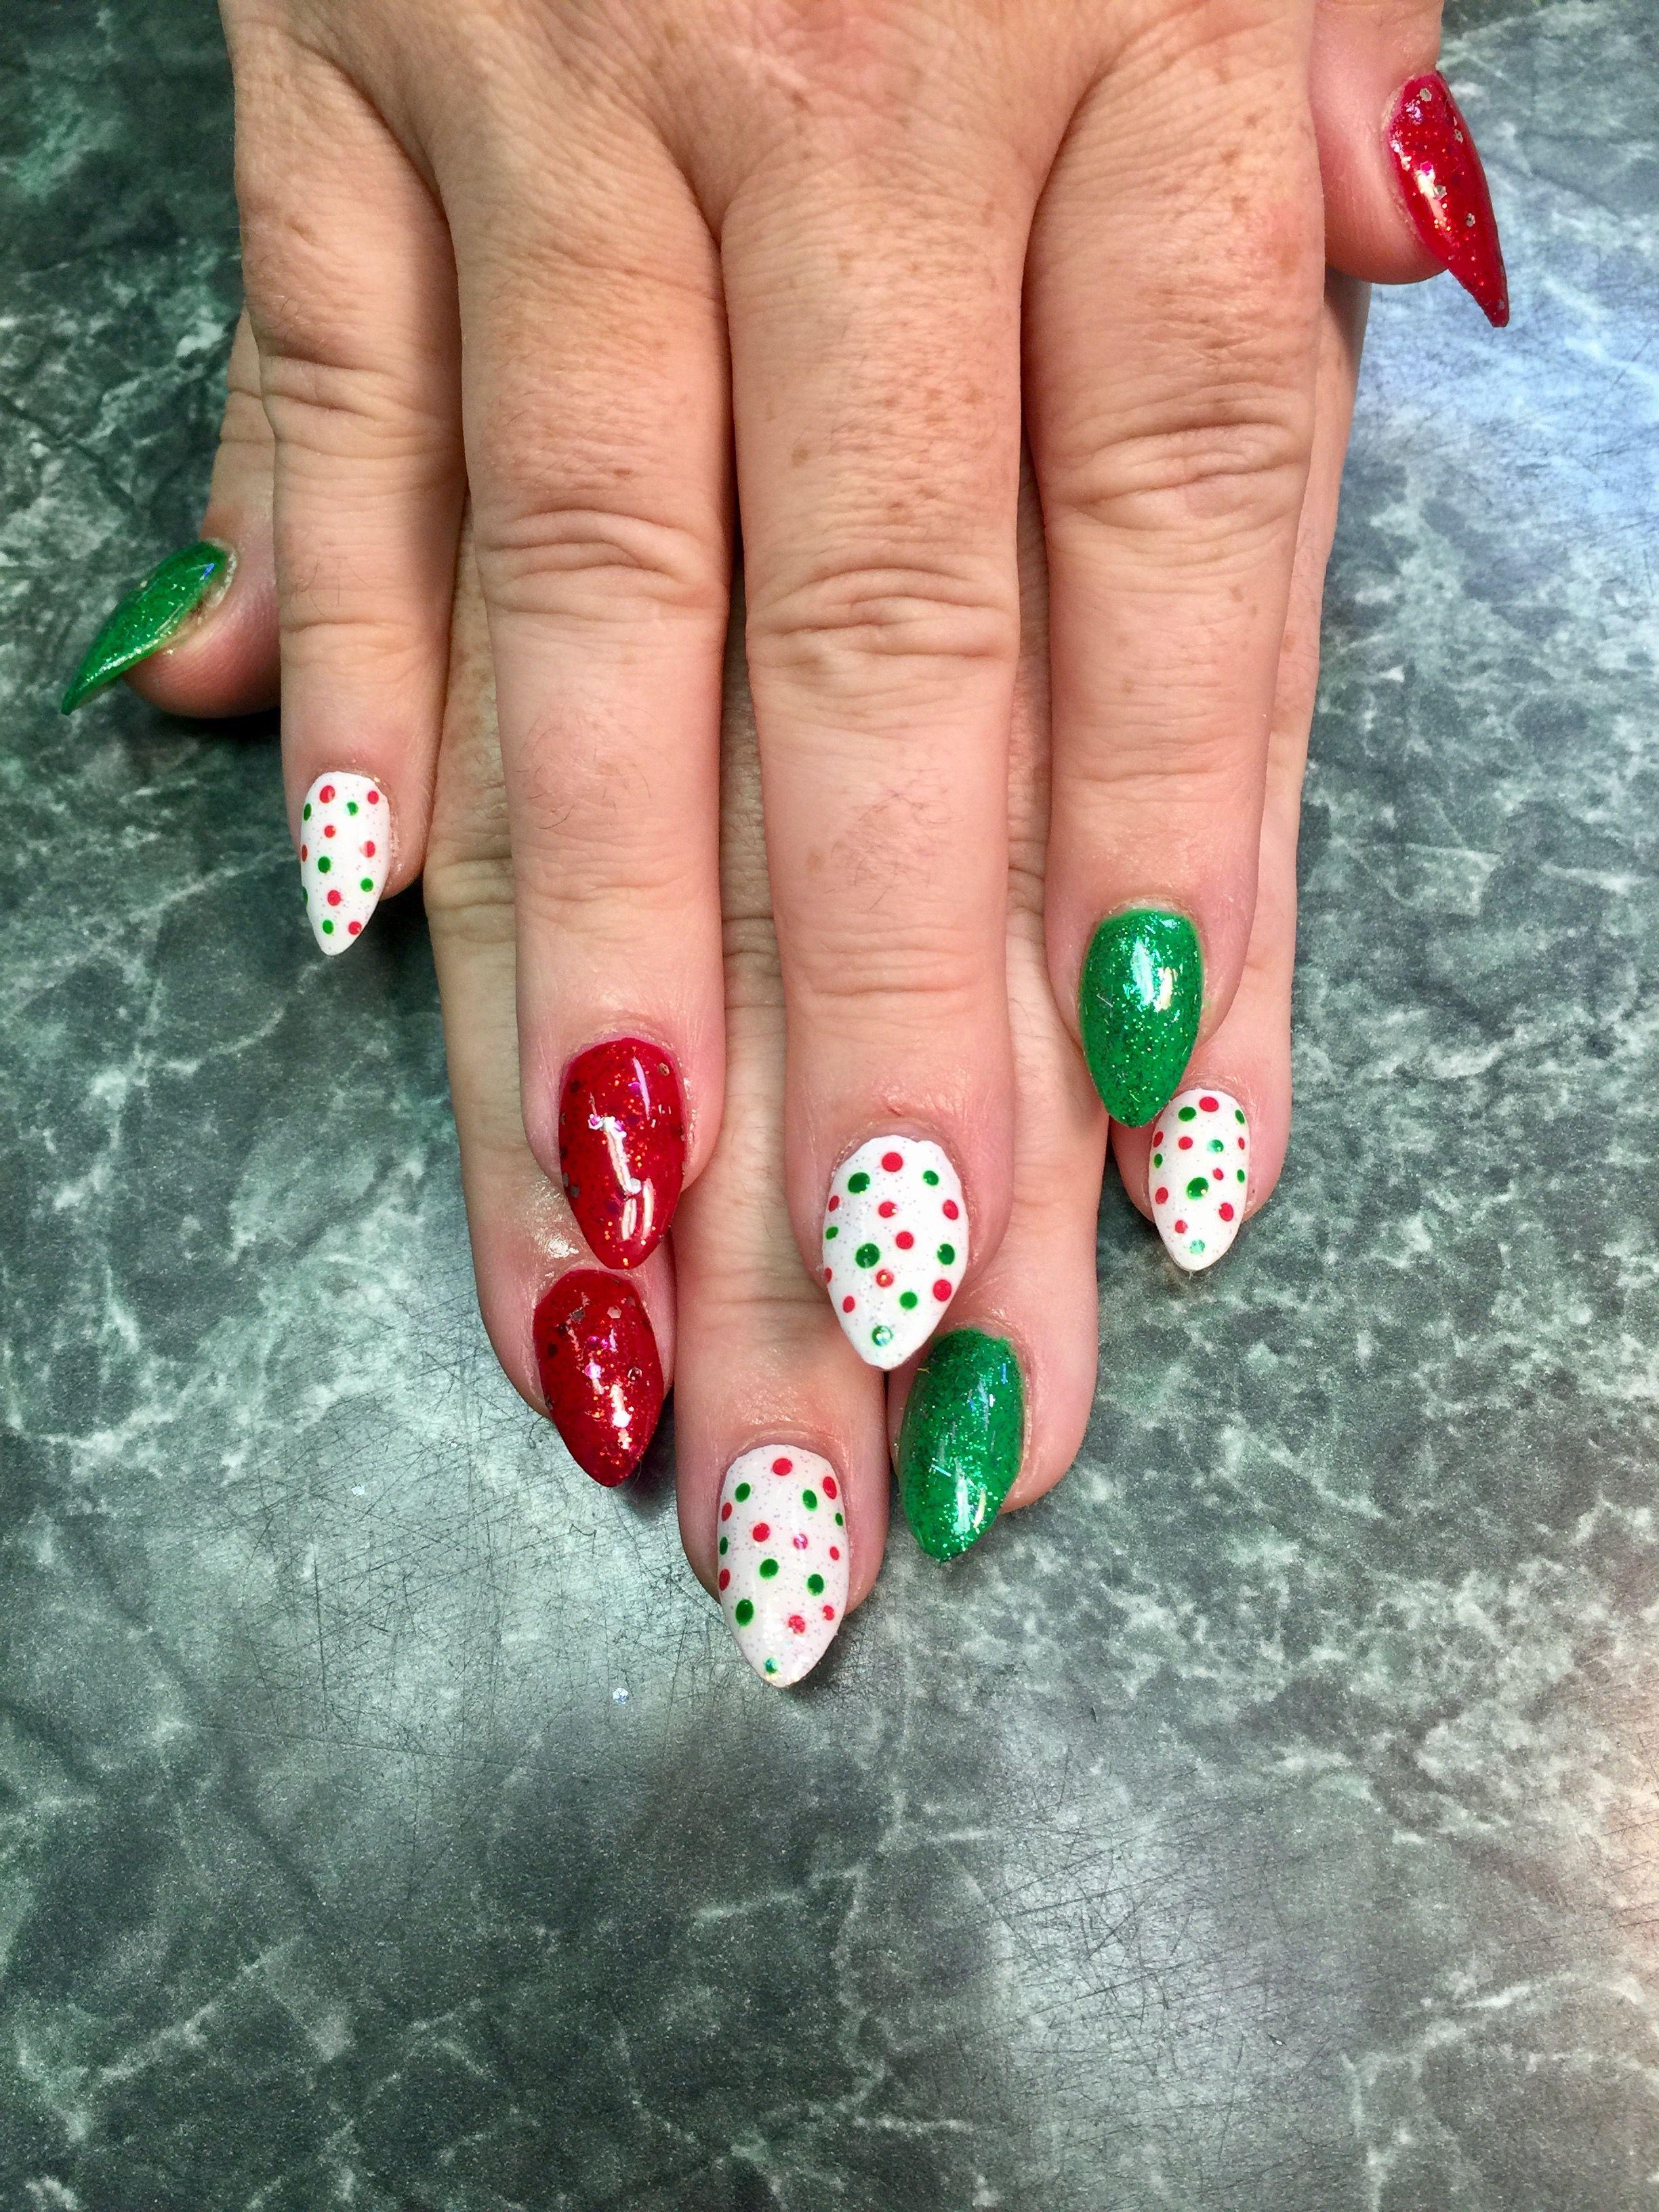 Red And Green Christmas Nails : green, christmas, nails, Green,, White,, Polka, Christmas, Nails, Nails,